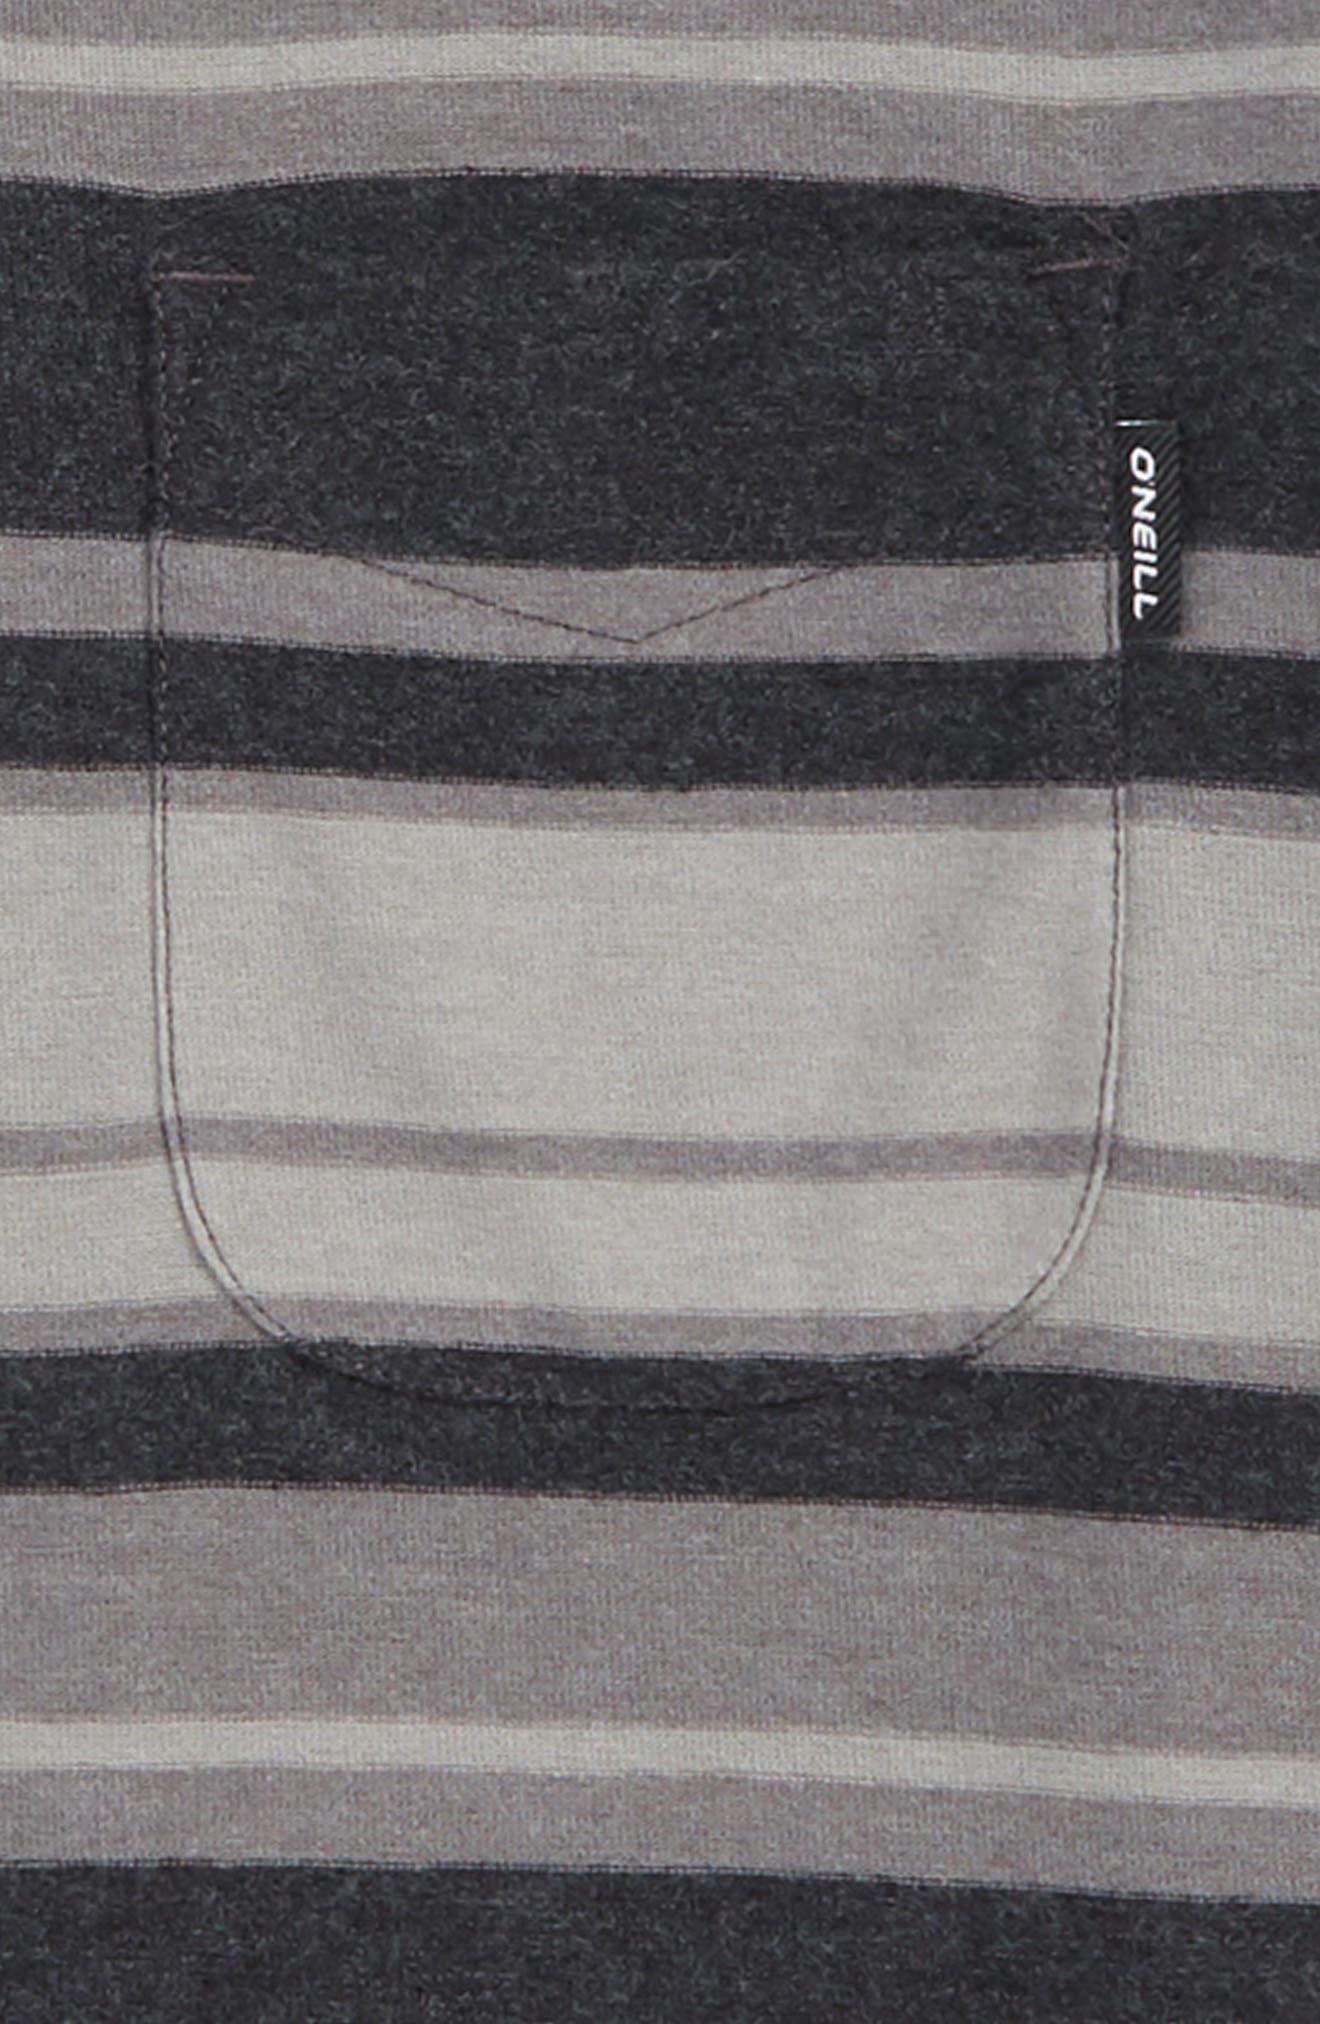 Pinnacle Pocket T-Shirt,                             Alternate thumbnail 2, color,                             BLACK